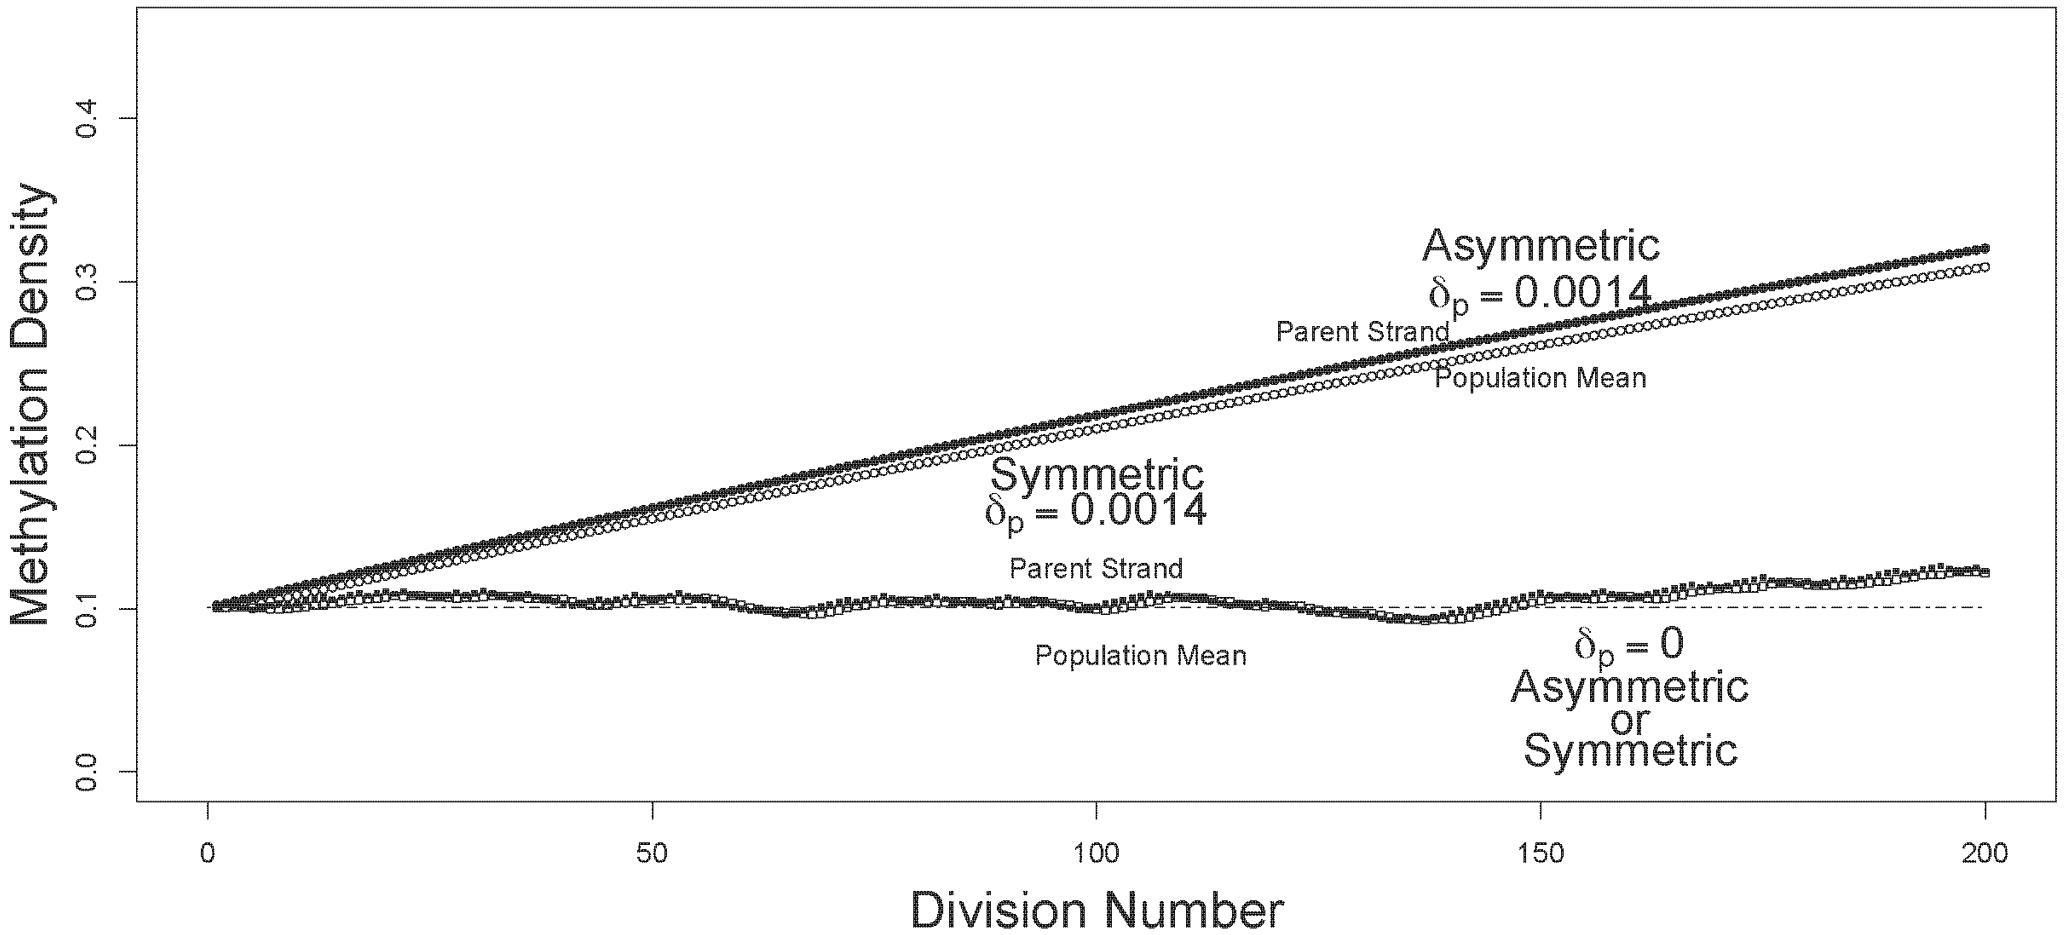 Trajectories of methylation densities under asymmetric or symmetric strand segregation, with low initial methylation density.